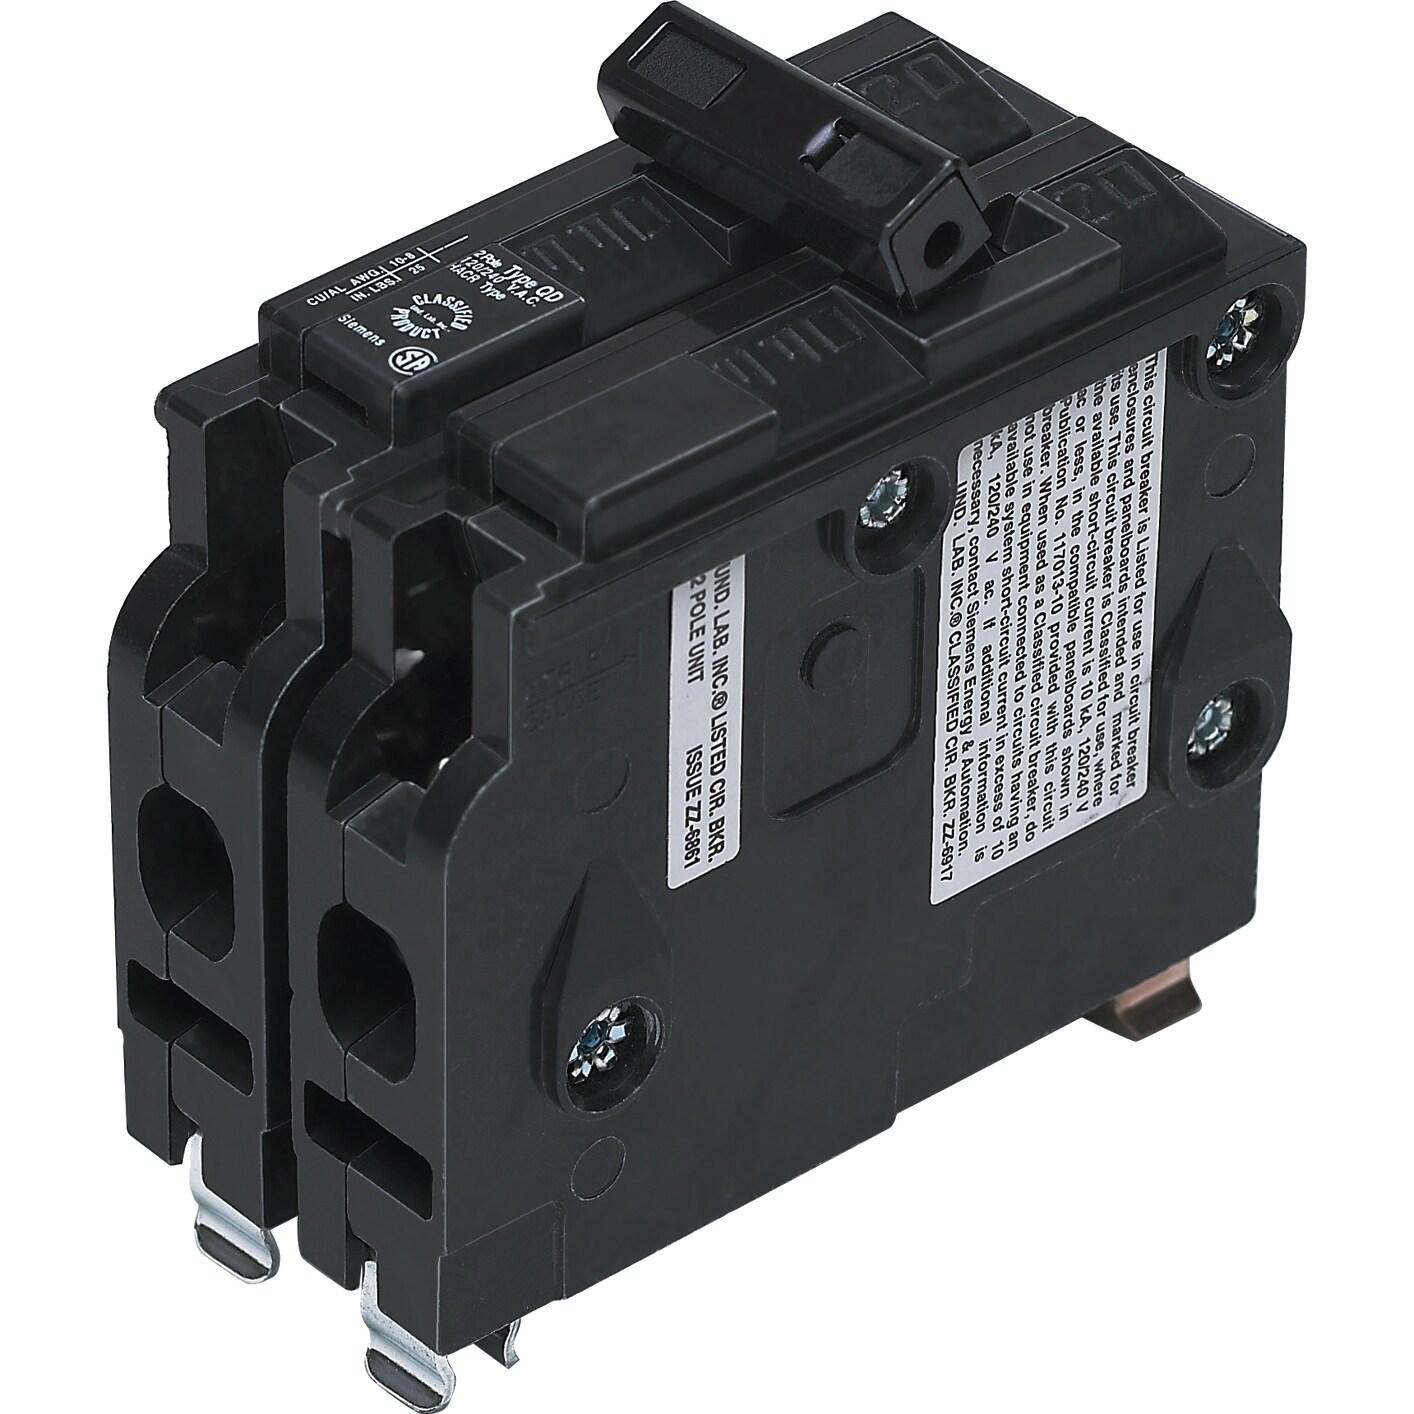 Siemens VPK-D220 20 Amp 2 Pole Circuit Breaker (Switches&...